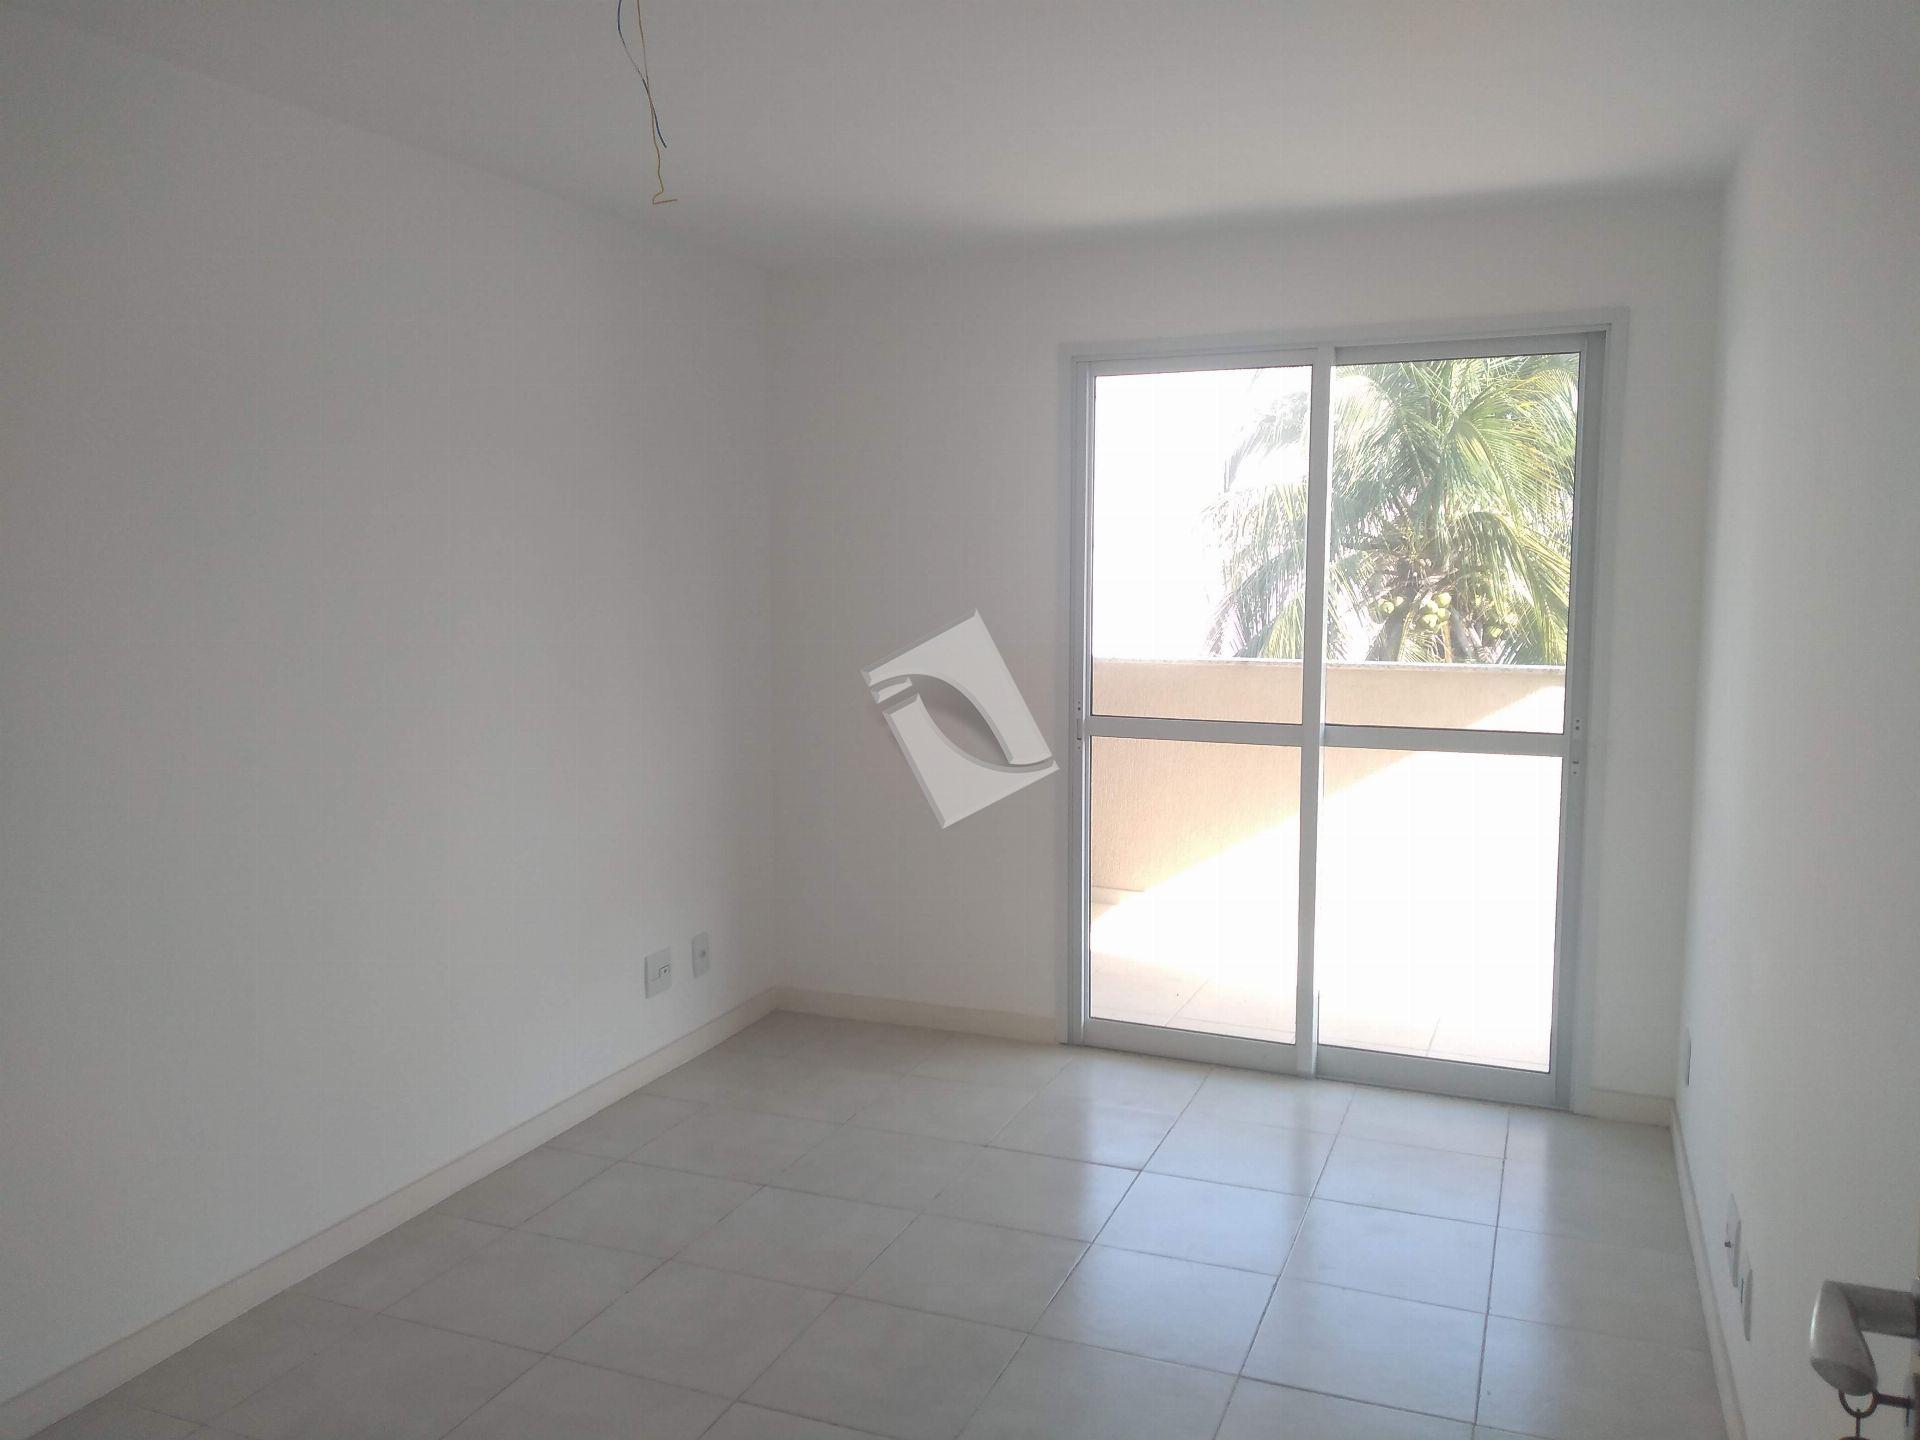 Apartamento Para Alugar - Recreio dos Bandeirantes - Rio de Janeiro - RJ - 042B - 4